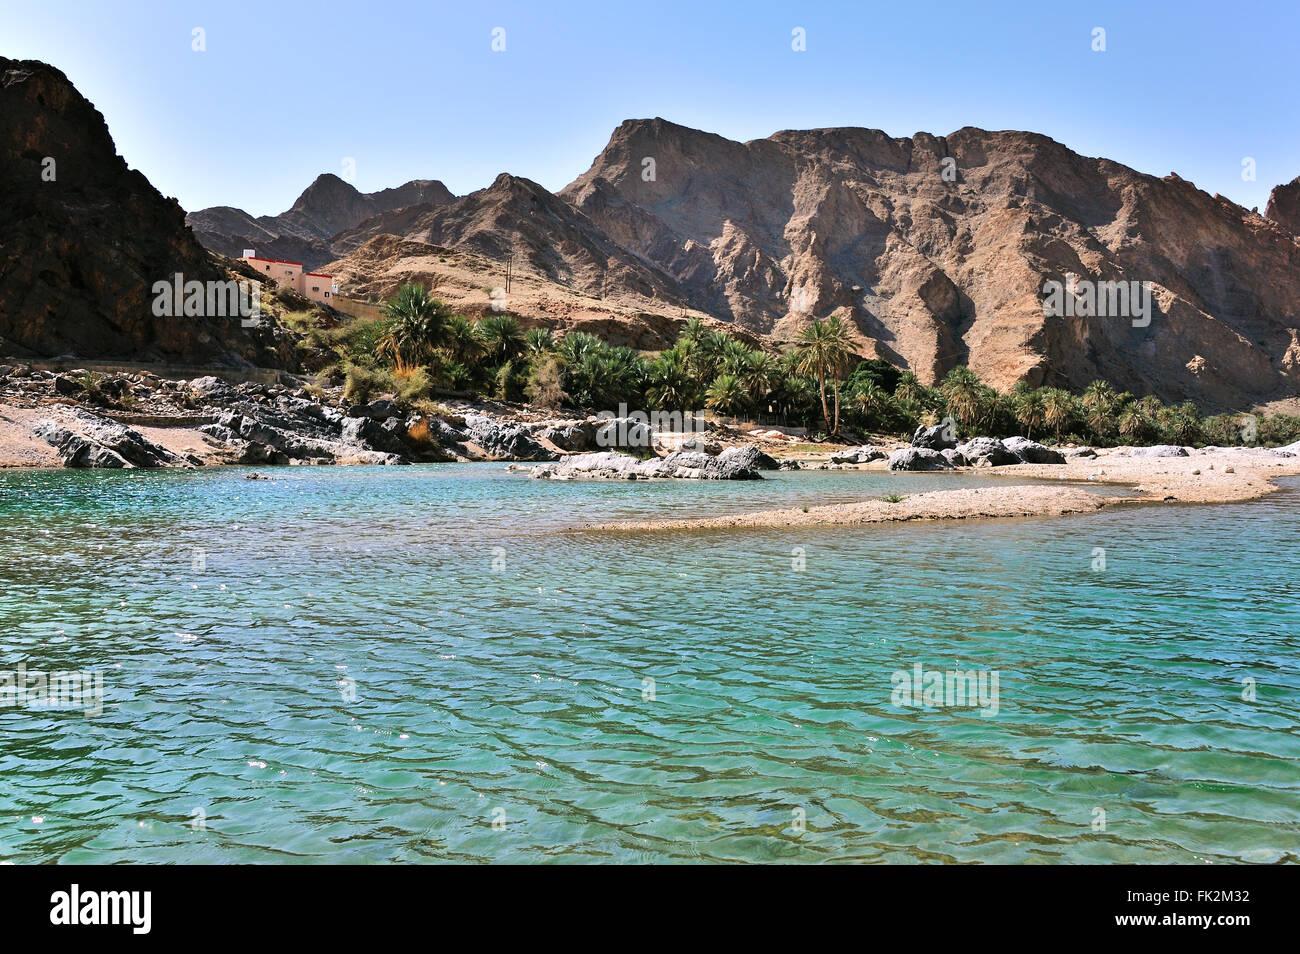 Wadi Arbie, near Fins, Sultanate of Oman - Stock Image